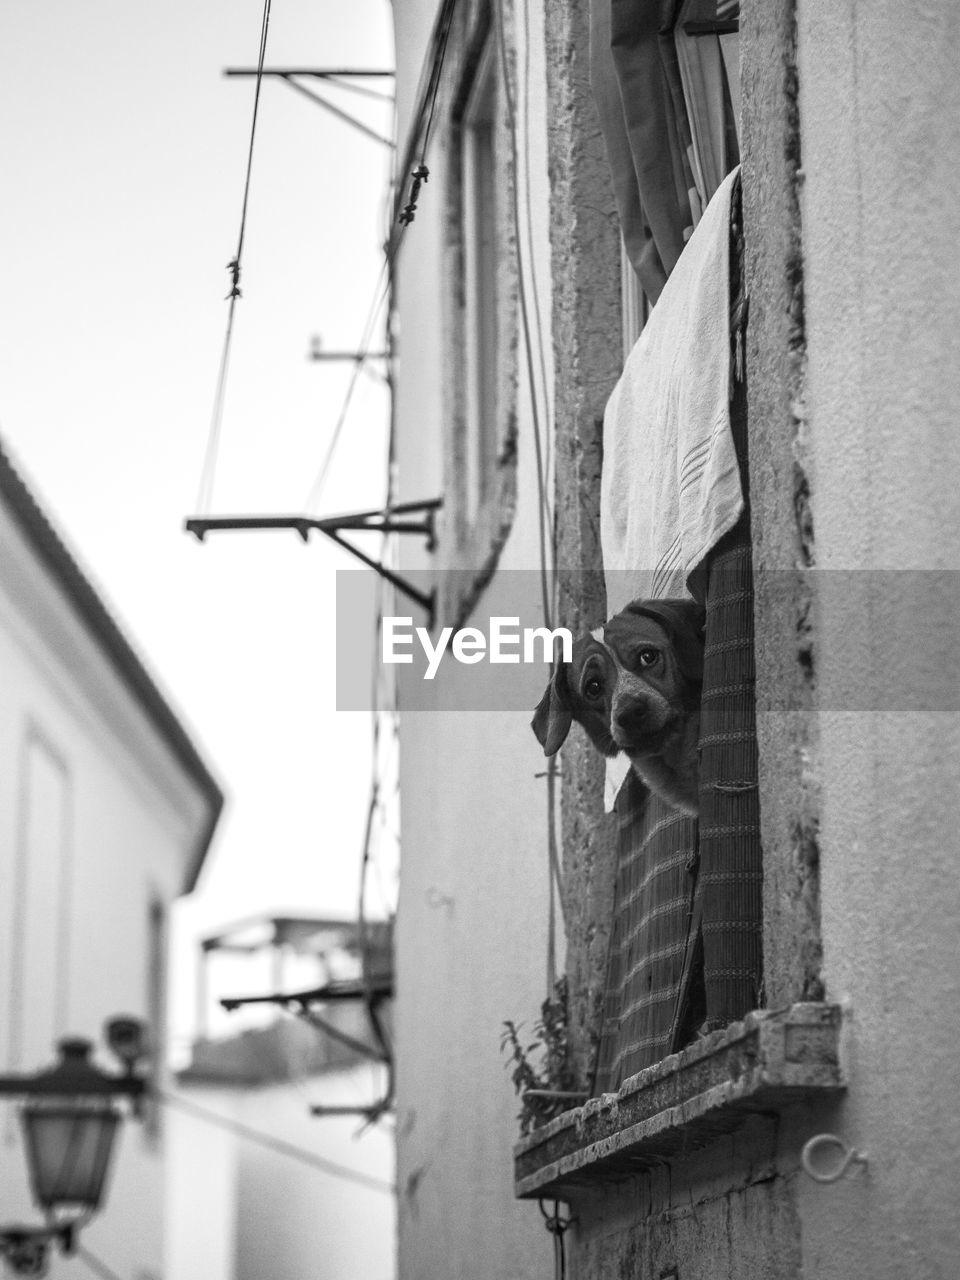 Portrait of cat on building window